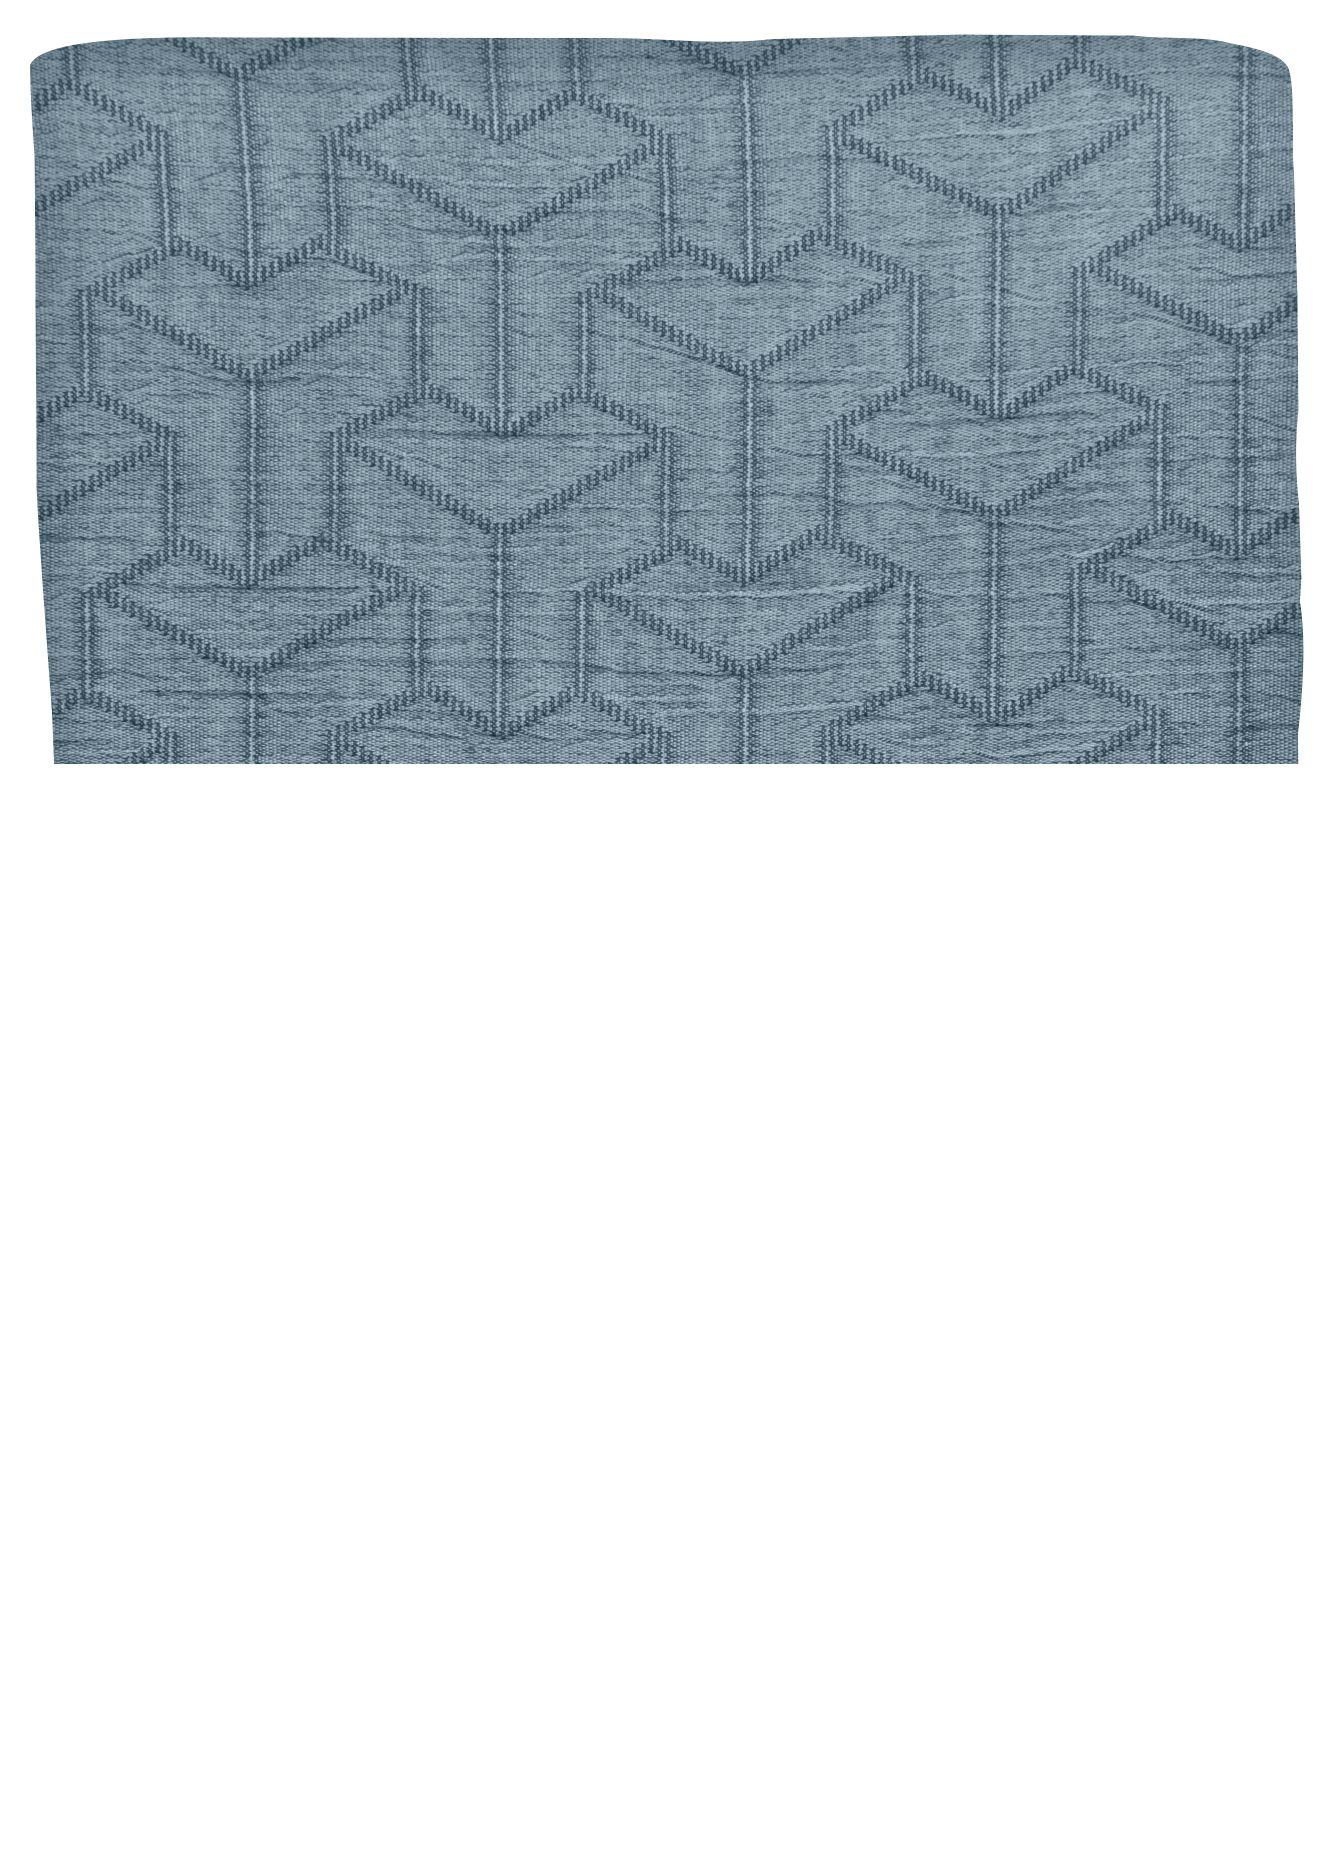 Mette Ditmer Trio sengetæppe, 140x250 cm, petrol blue